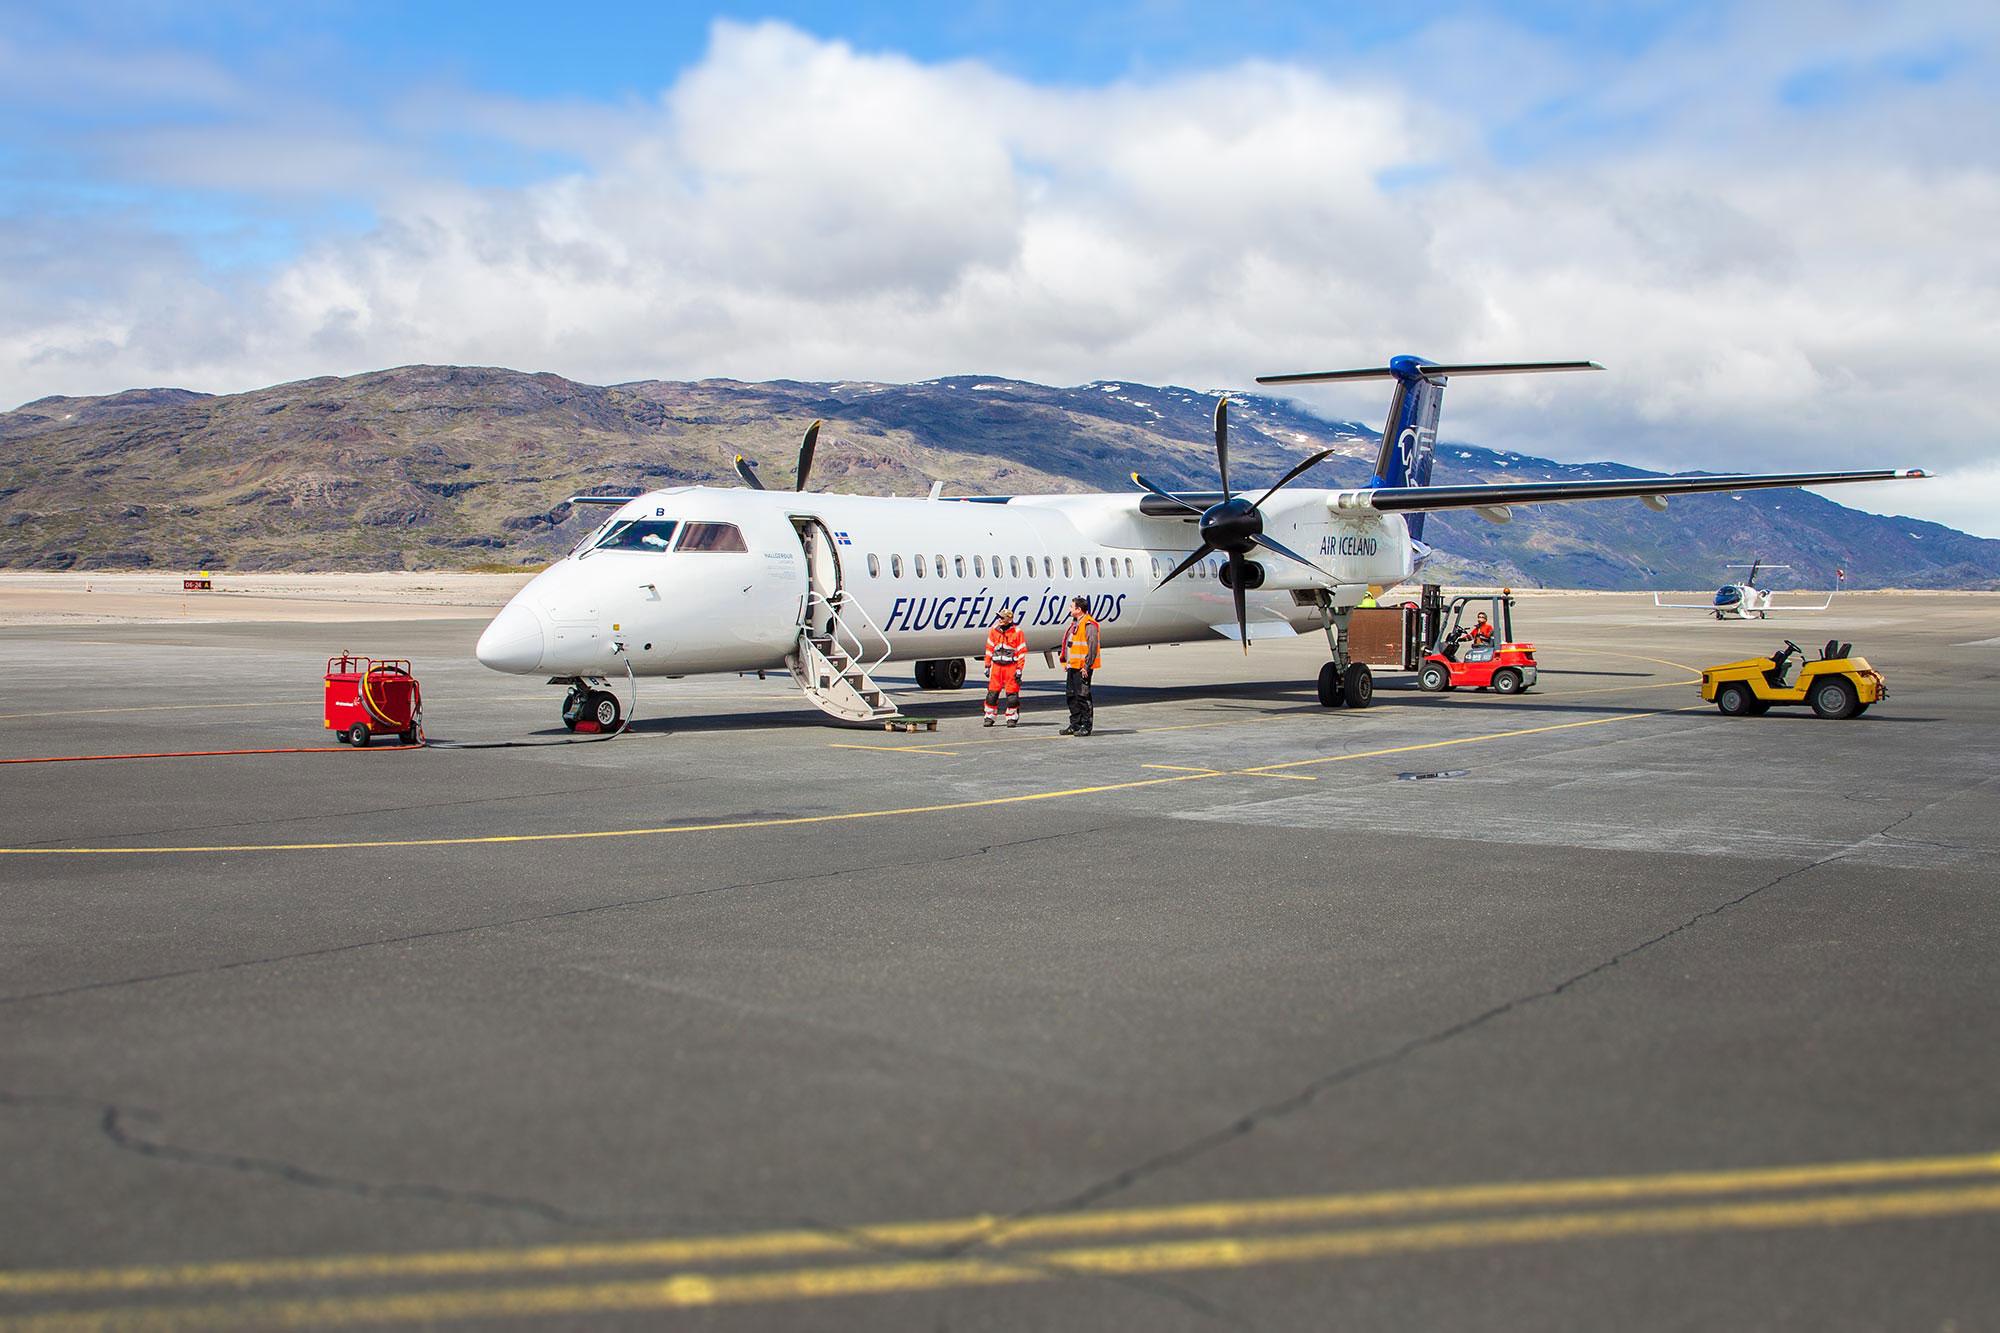 Landing in Narsarsuaq airport, Greenland